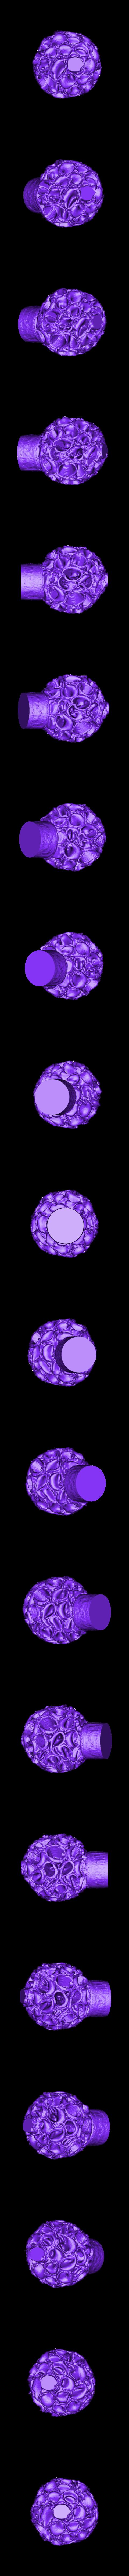 Curly_Flower_Scan.stl Download free STL file Curly Flower Scan • 3D printable model, ErnyCrazyPrinter